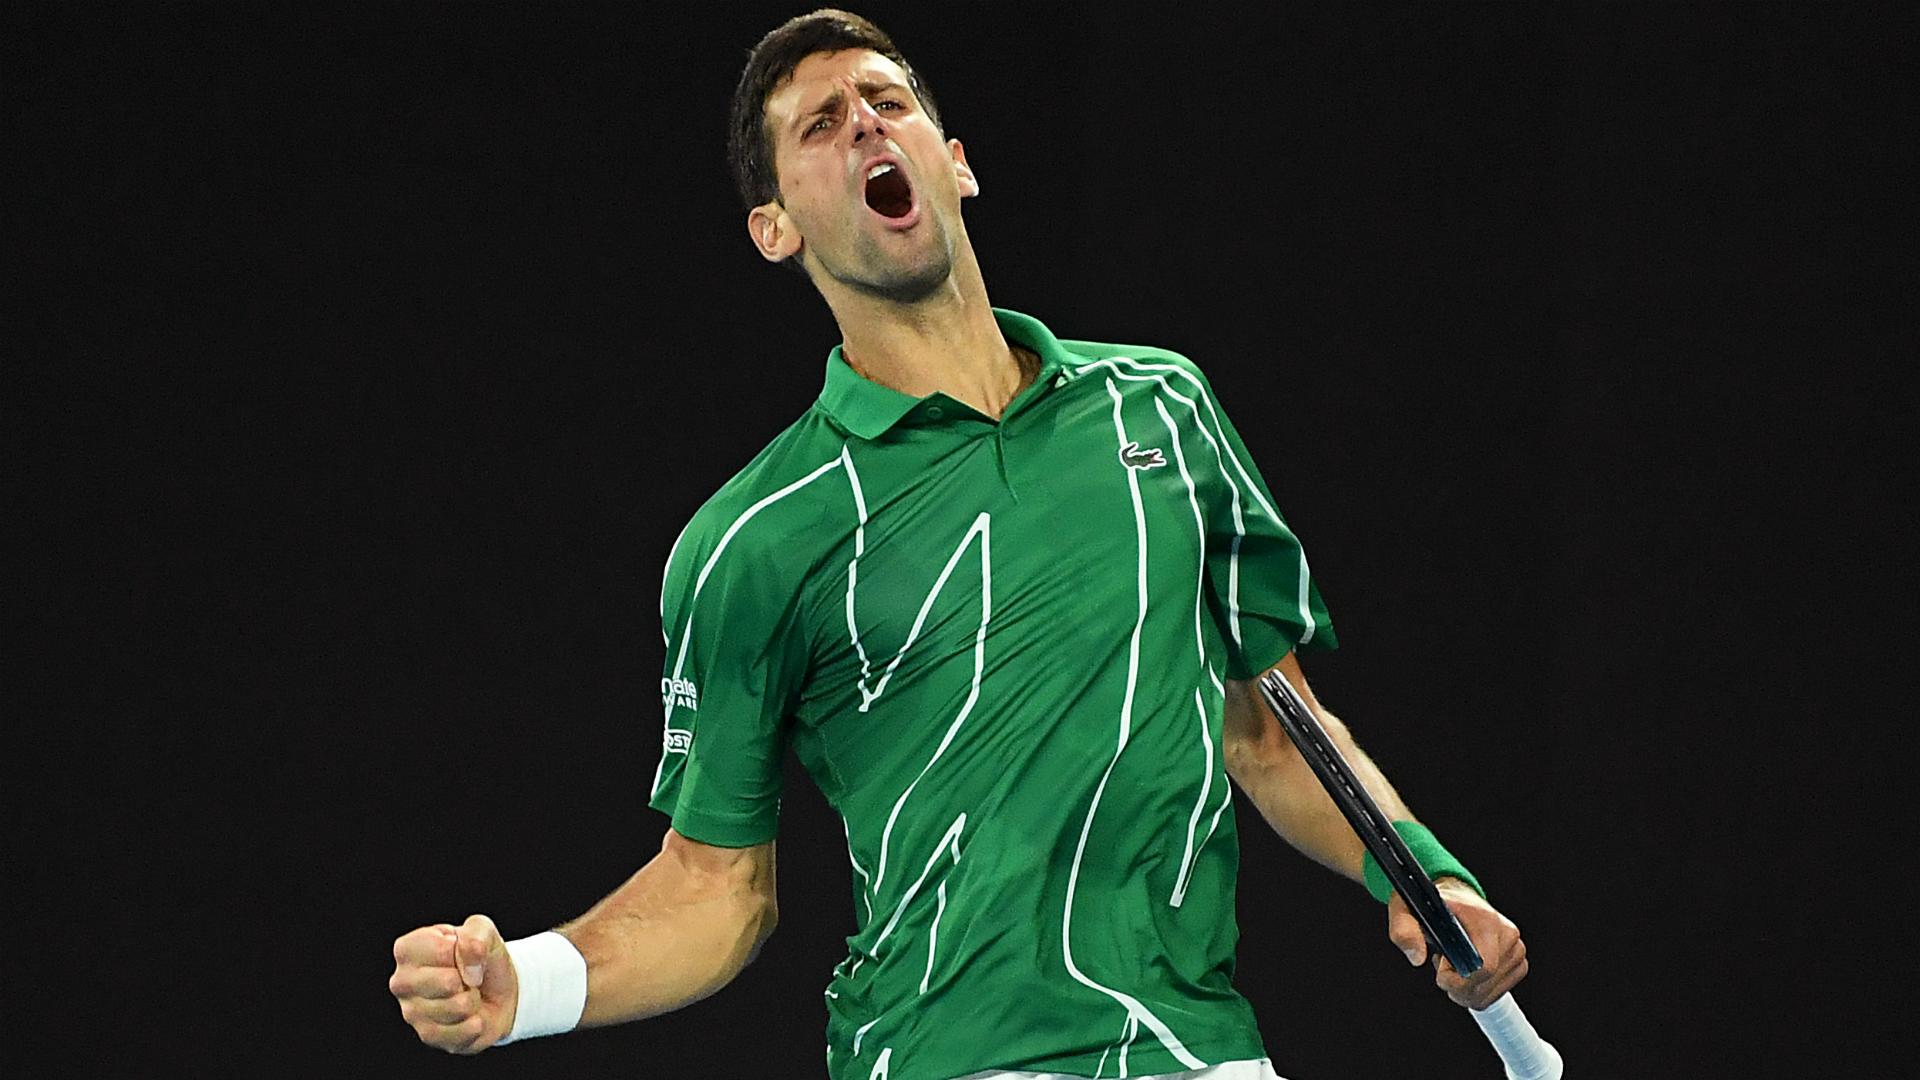 Australian Open 2020: Djokovic books Federer showdown after dismissing Raonic